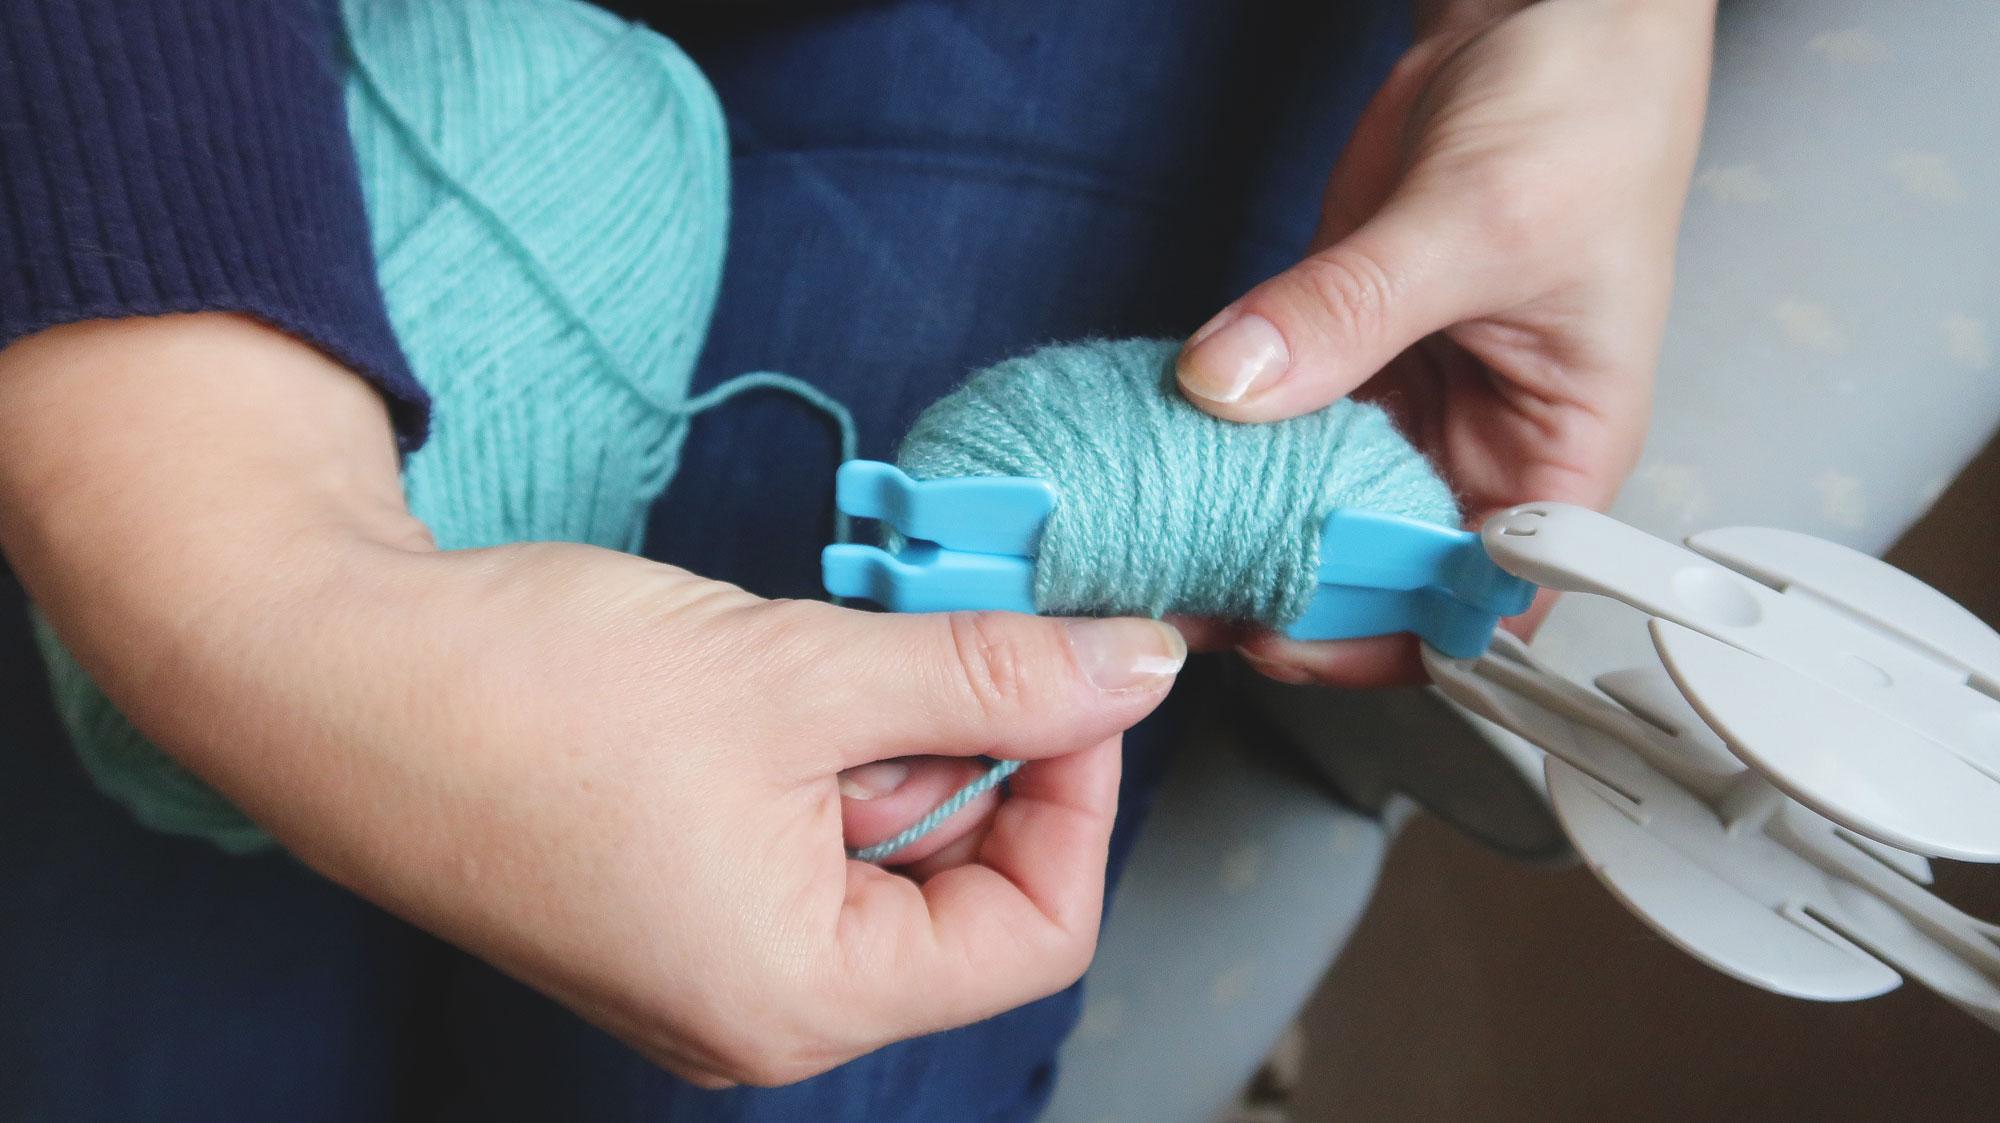 pom_pom_making_winding_yarn